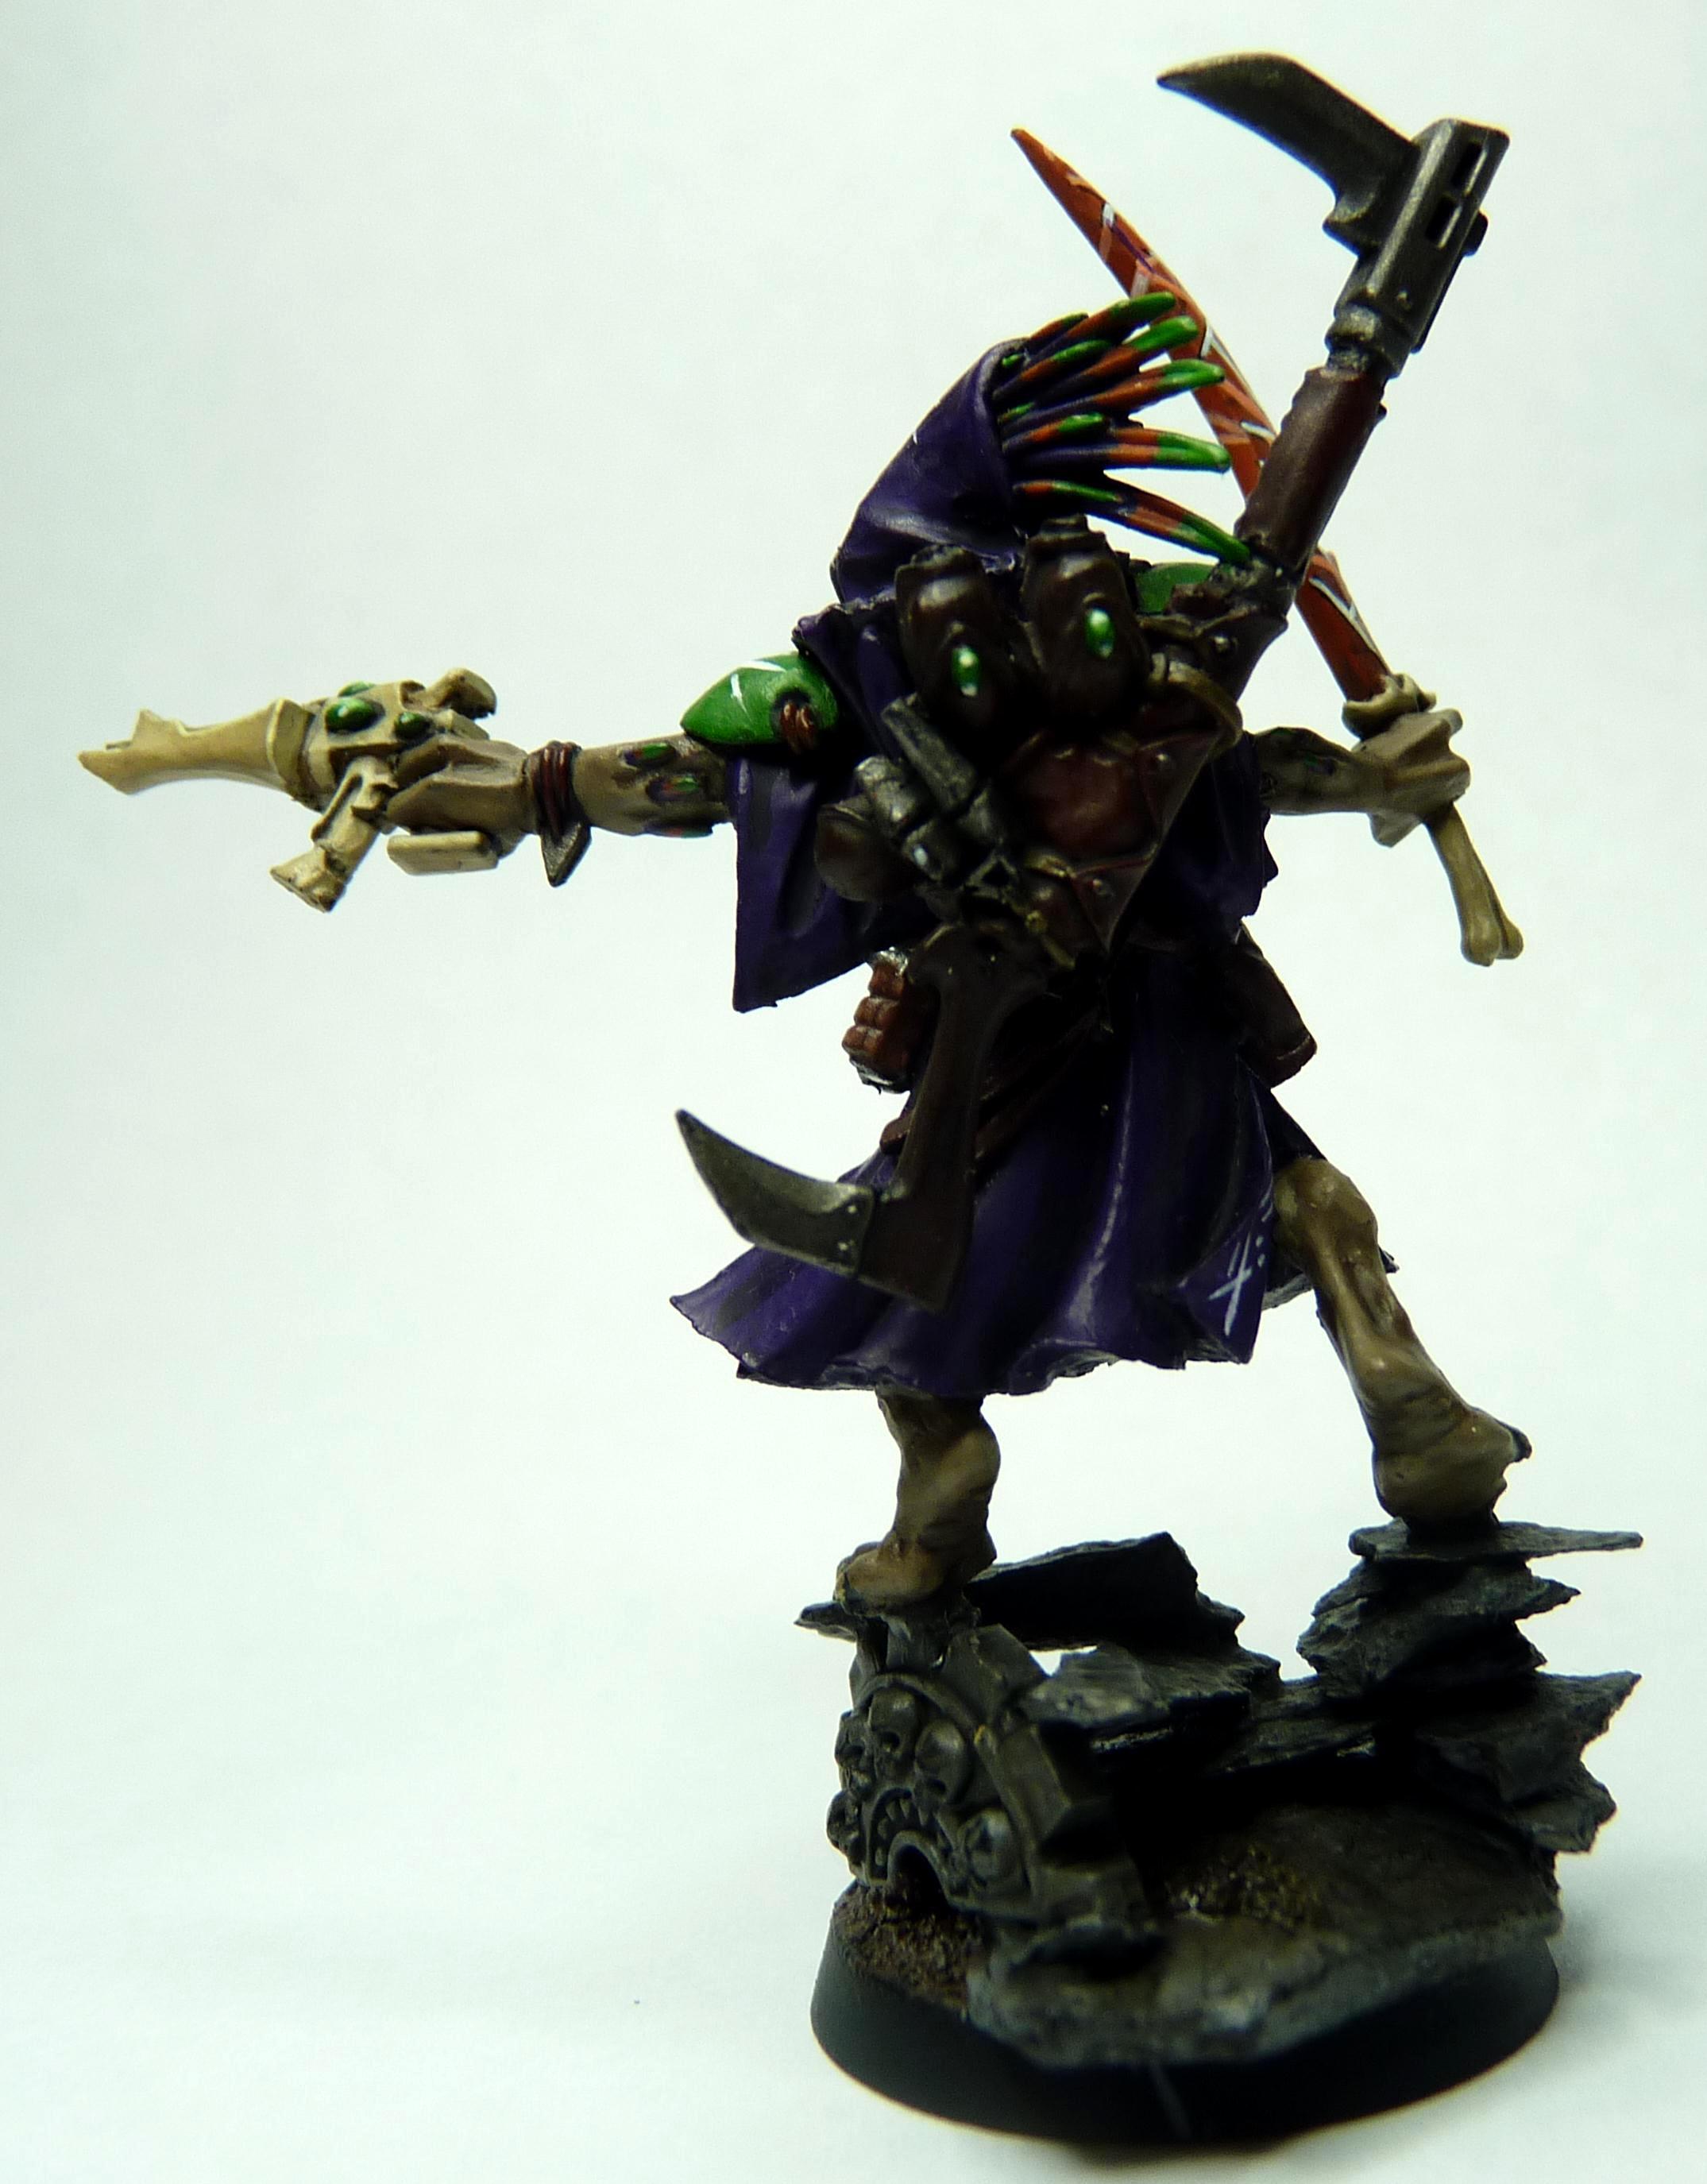 Kroot shaman/shaper